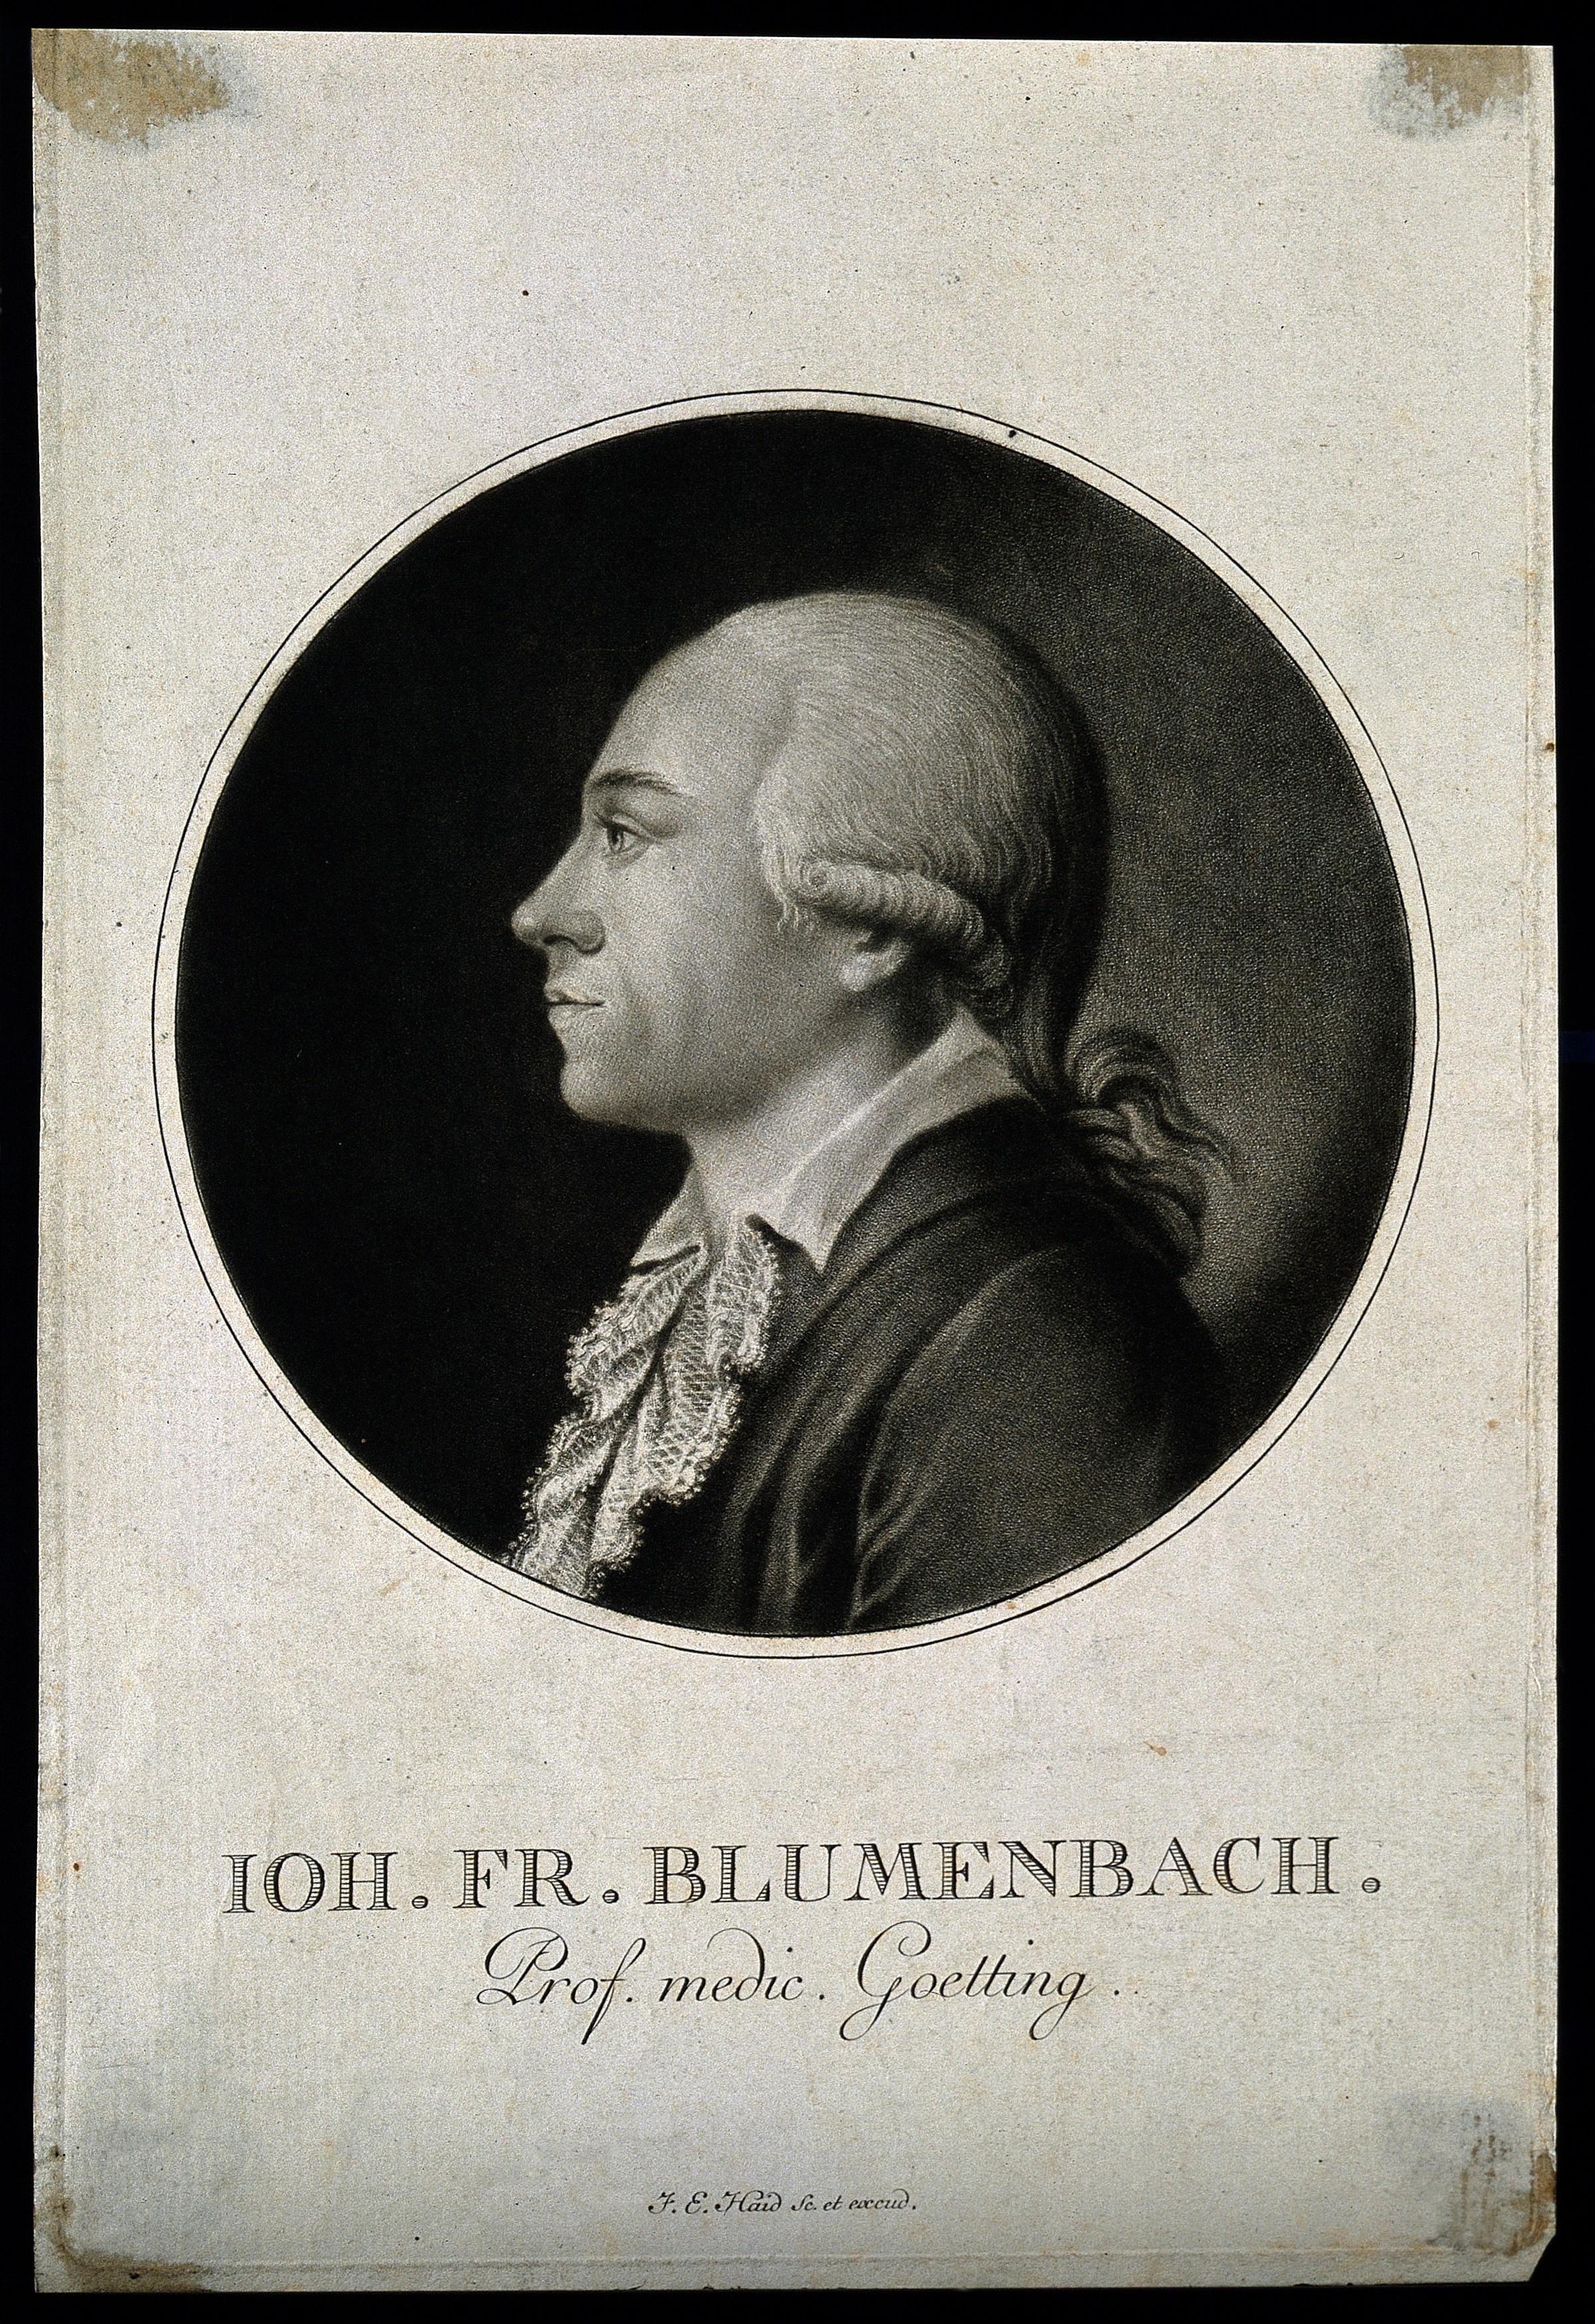 File:Johann Friedrich Blumenbach. Mezzotint by F. E. Haid. Wellcome V0000601.jpg